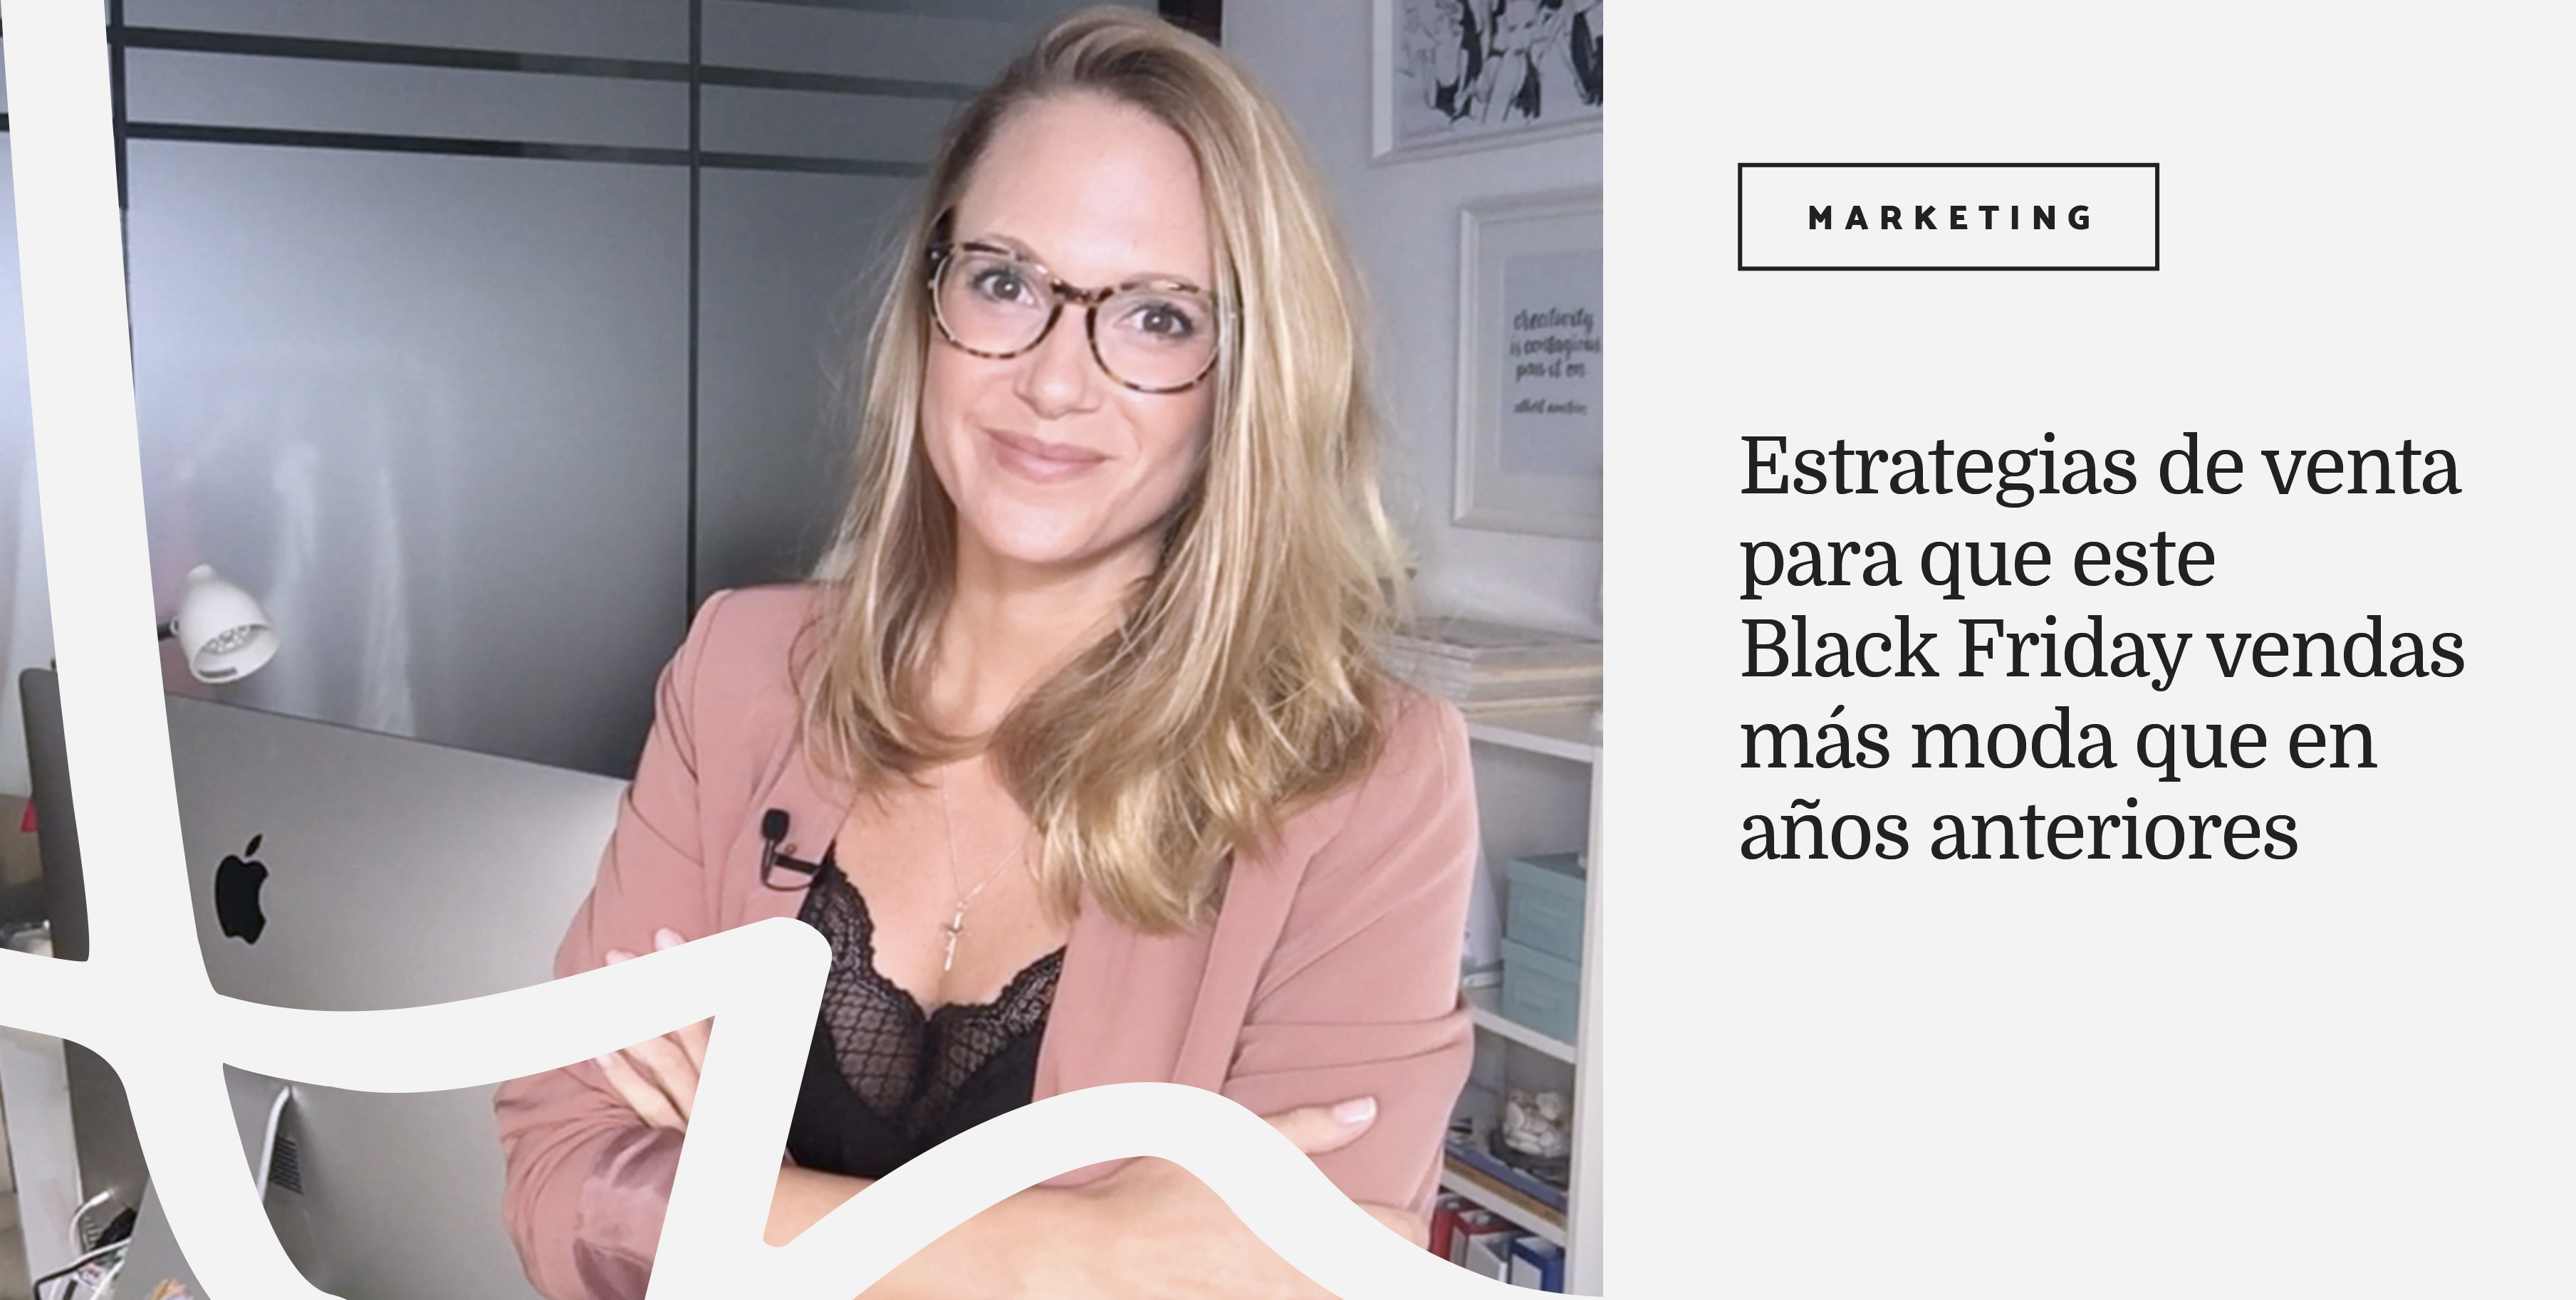 Black-Friday-estrategias-en-Moda-Moda-Ana-Diaz-del-Rio-portada-03.jpg